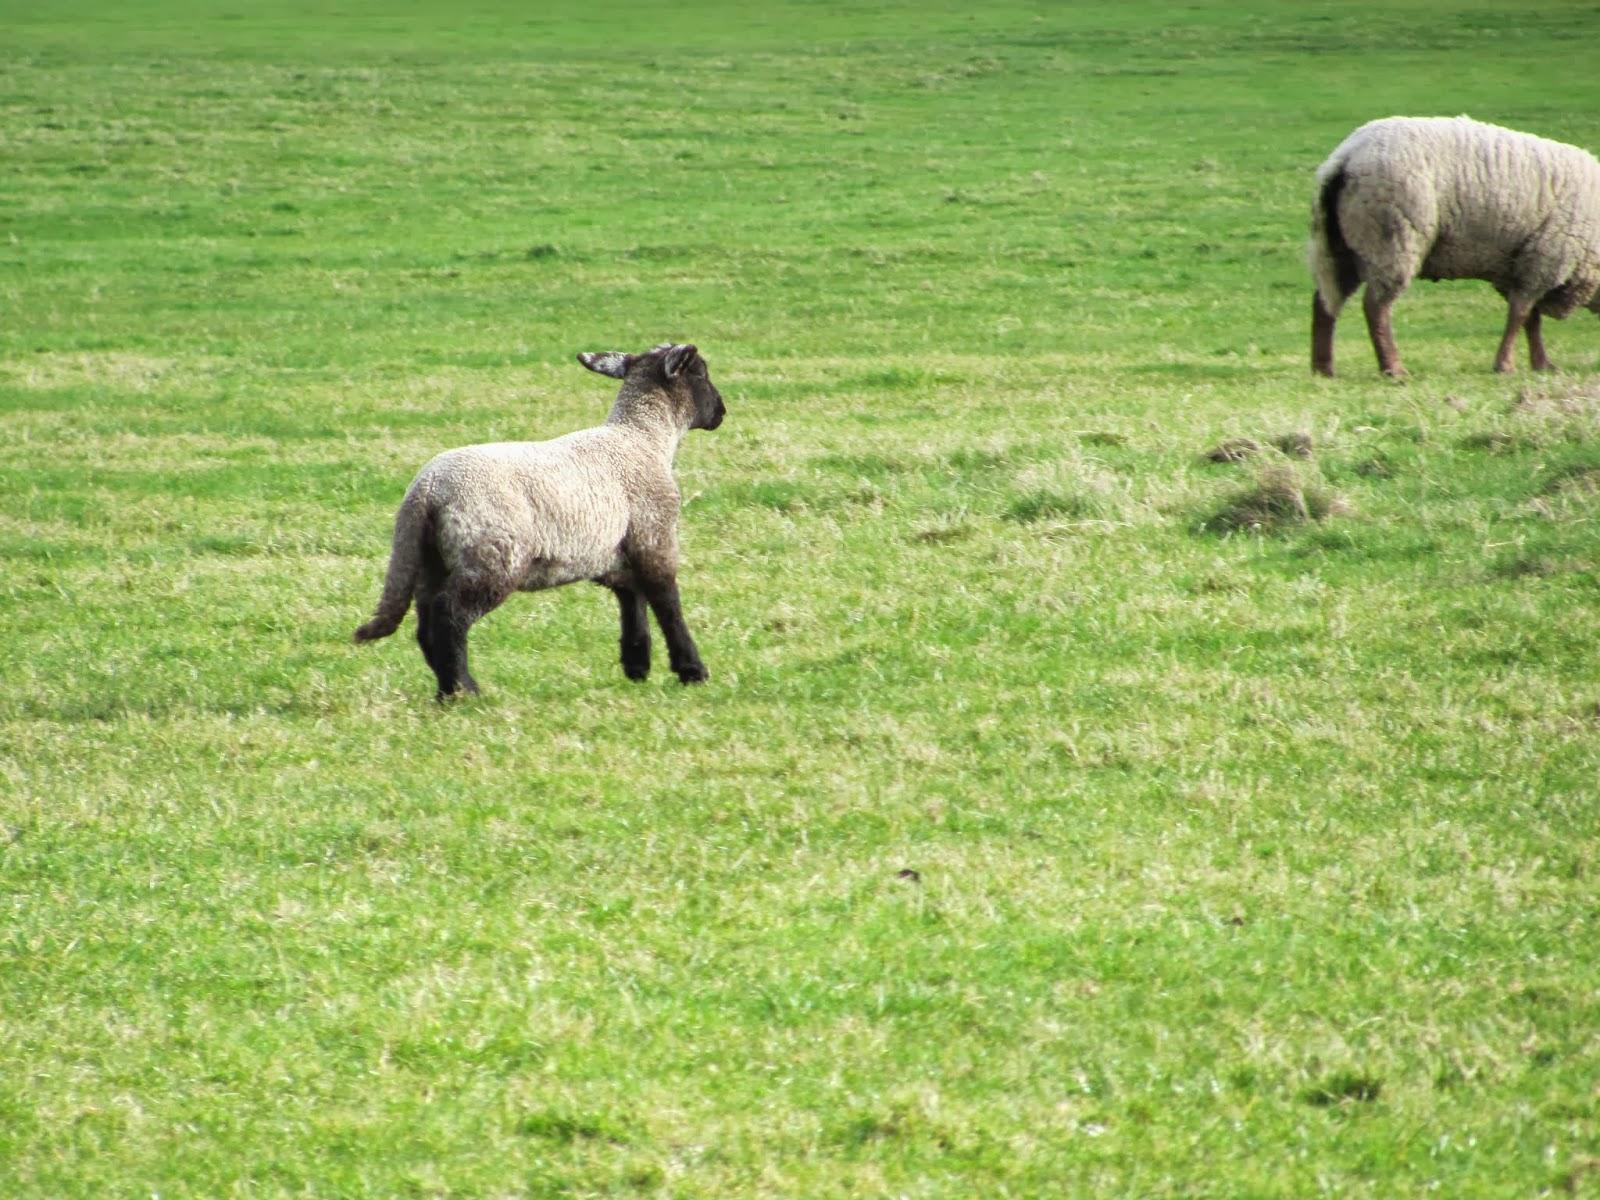 A lamb in Trim, Ireland